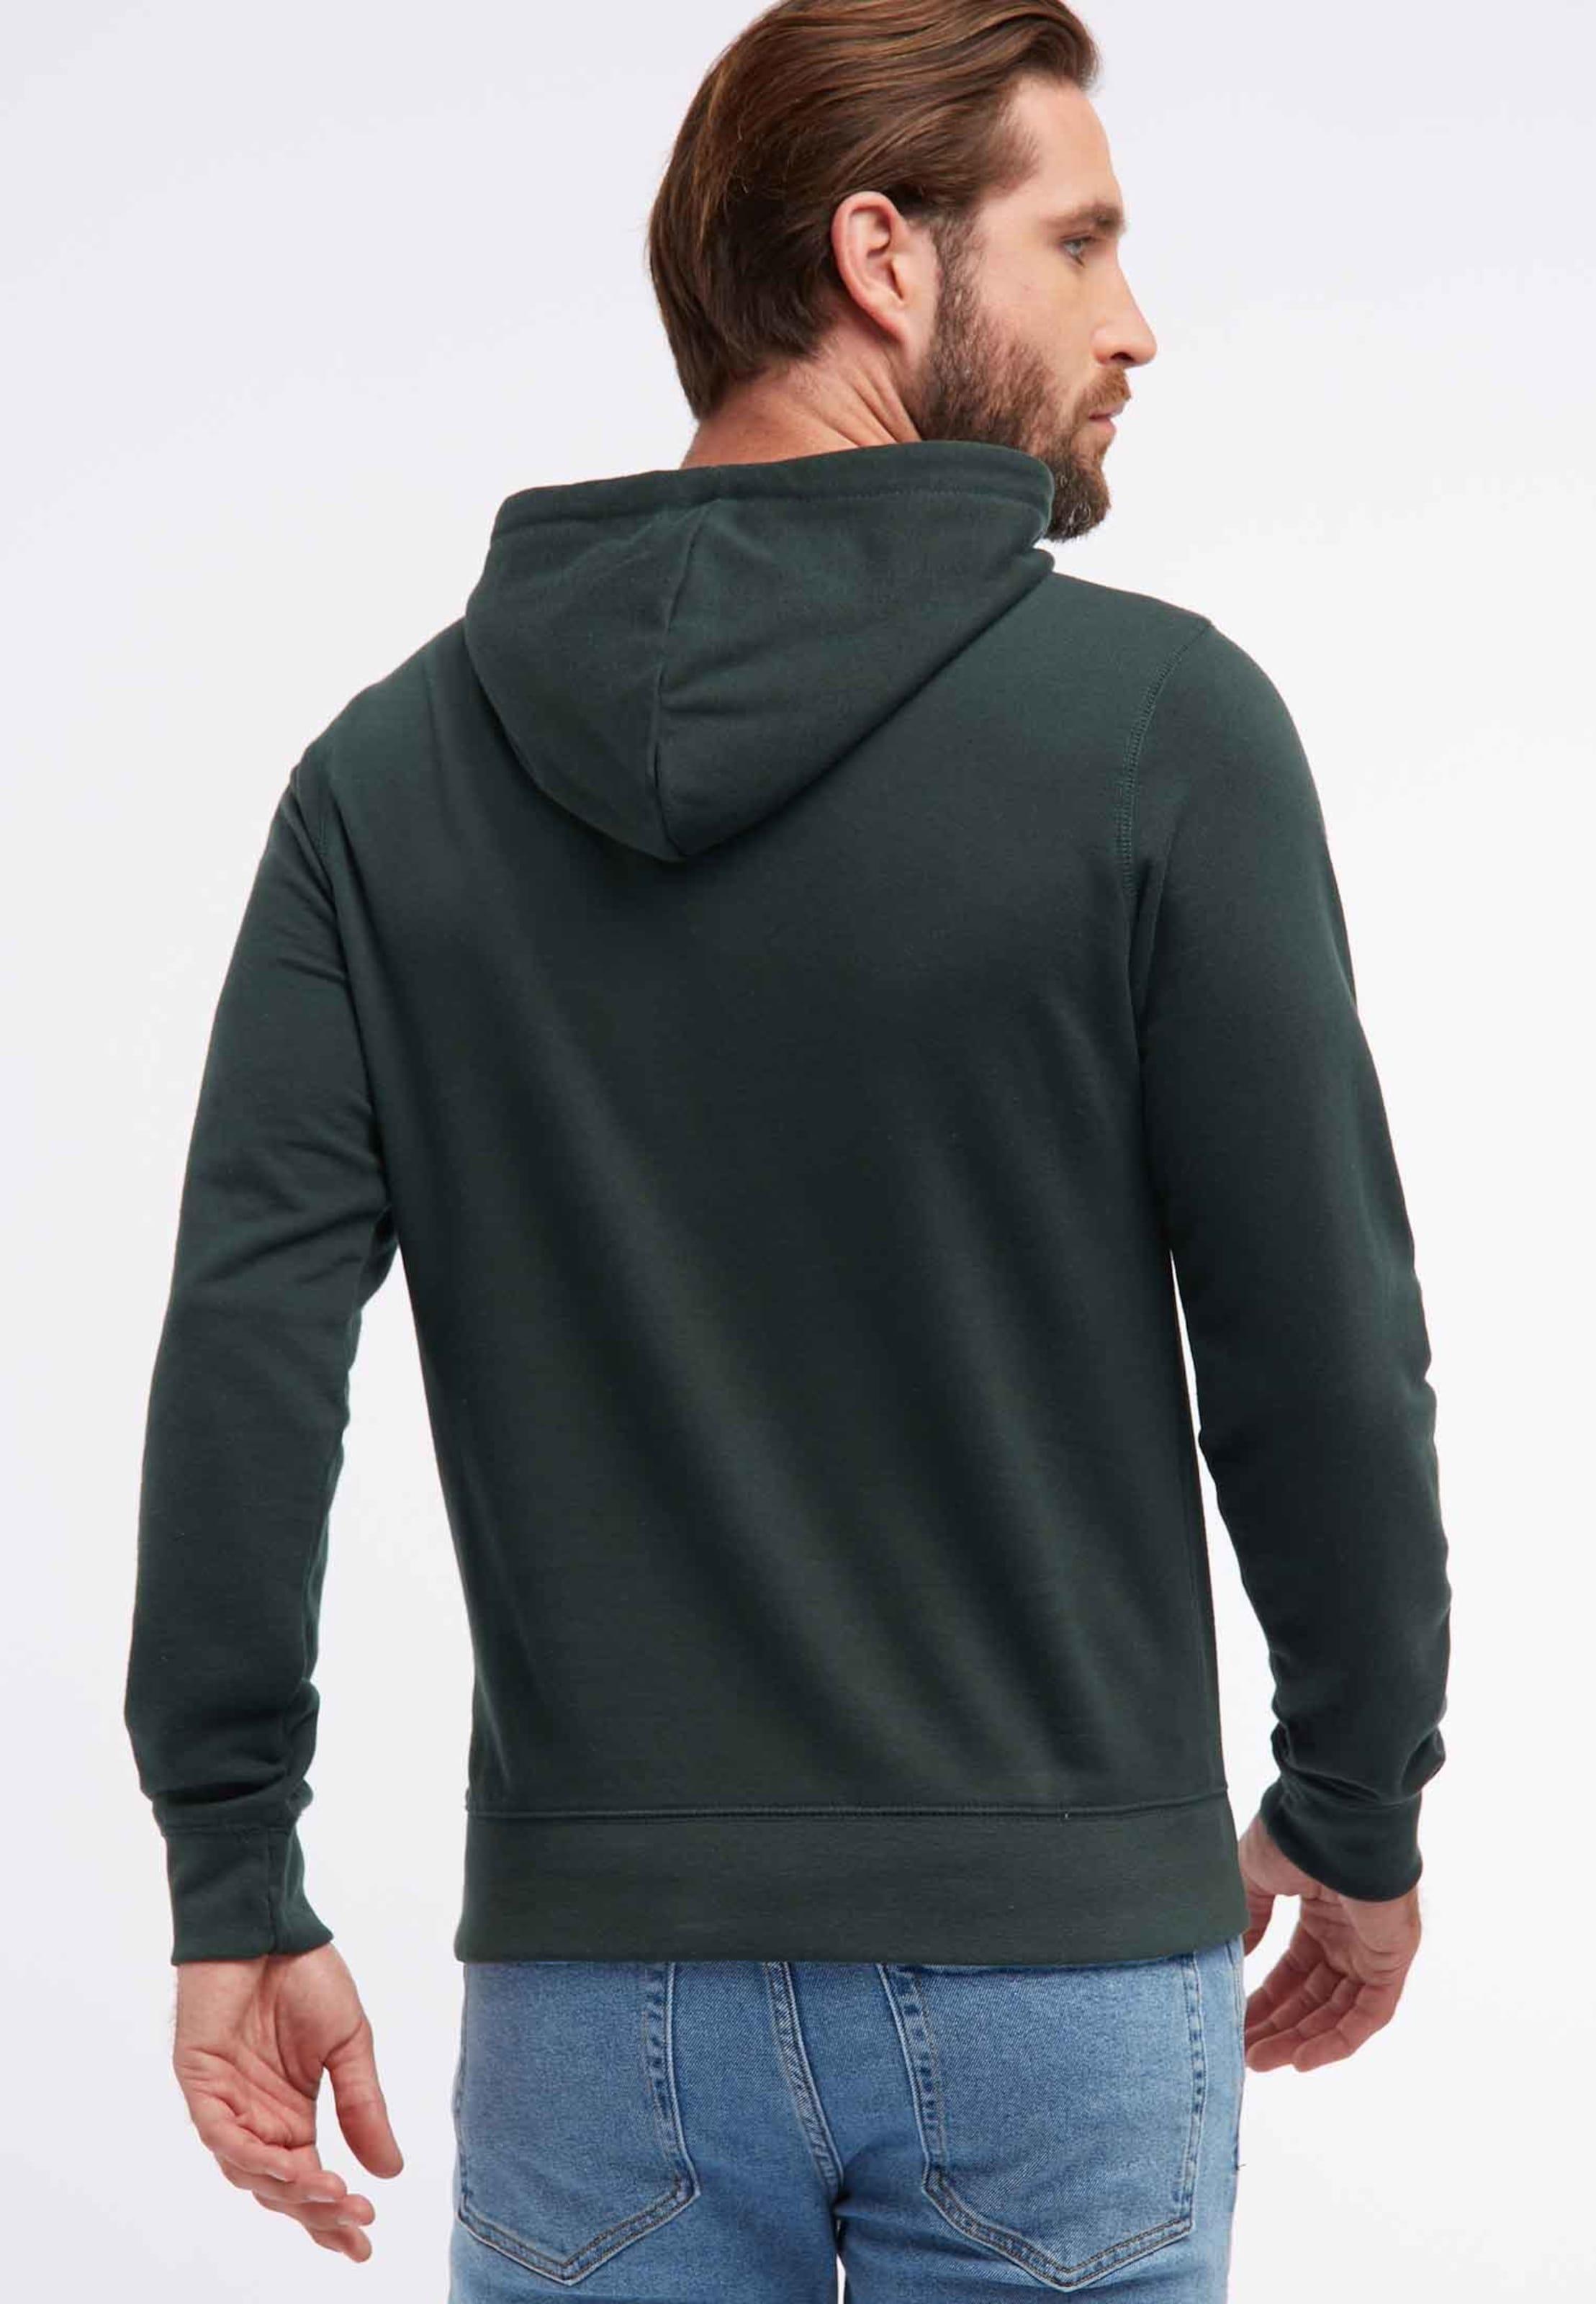 Vert Industries shirt Petrol En Sweat Foncé w0kP8nO